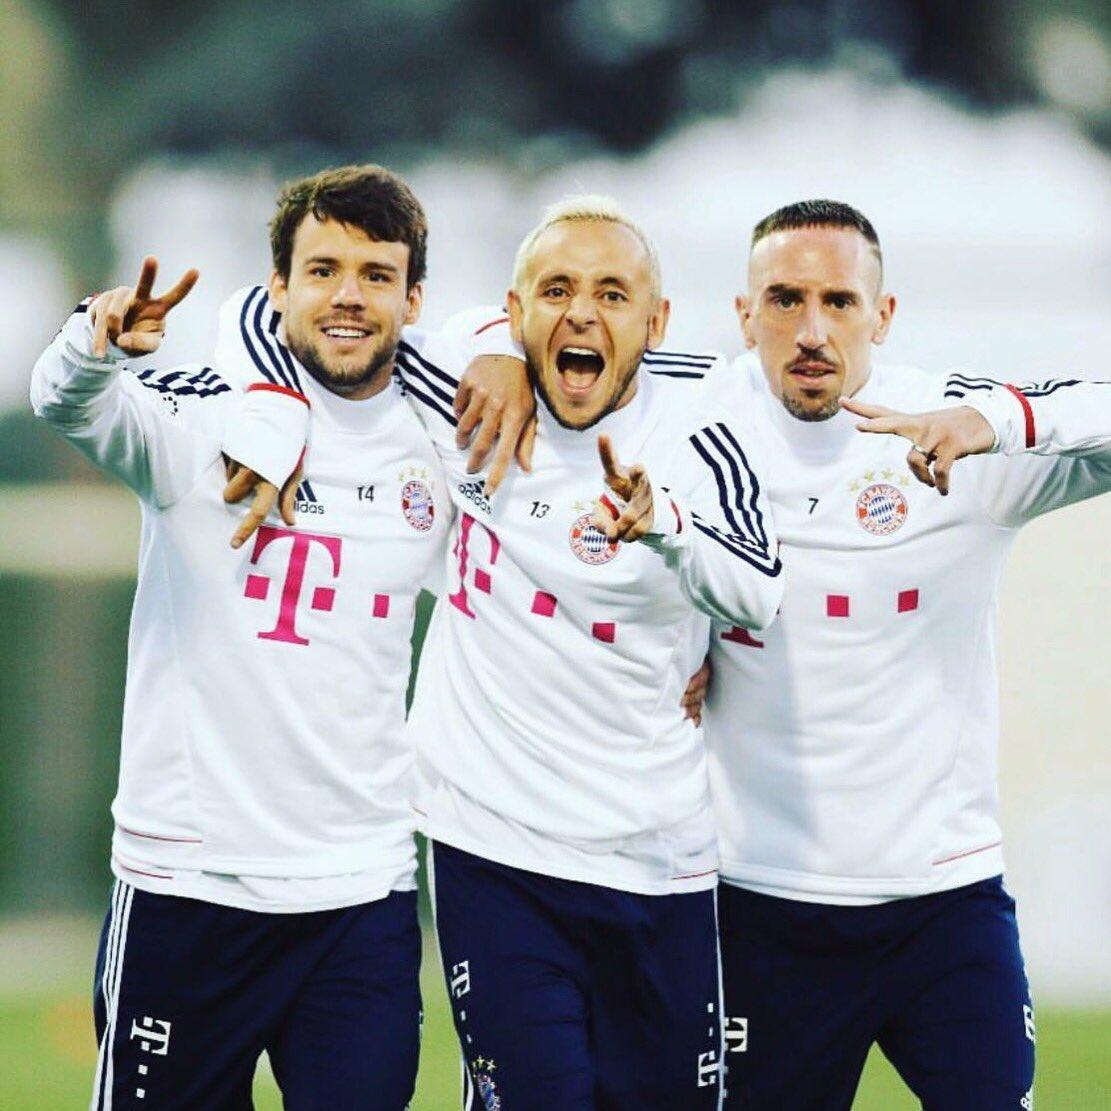 RT @FranckRibery: Think you can see it - we're ready for tomorrow 🔥⚽️😉✌🏼 #B04FCB #MiaSanMia @FCBayern https://t.co/tVp8Cja11K